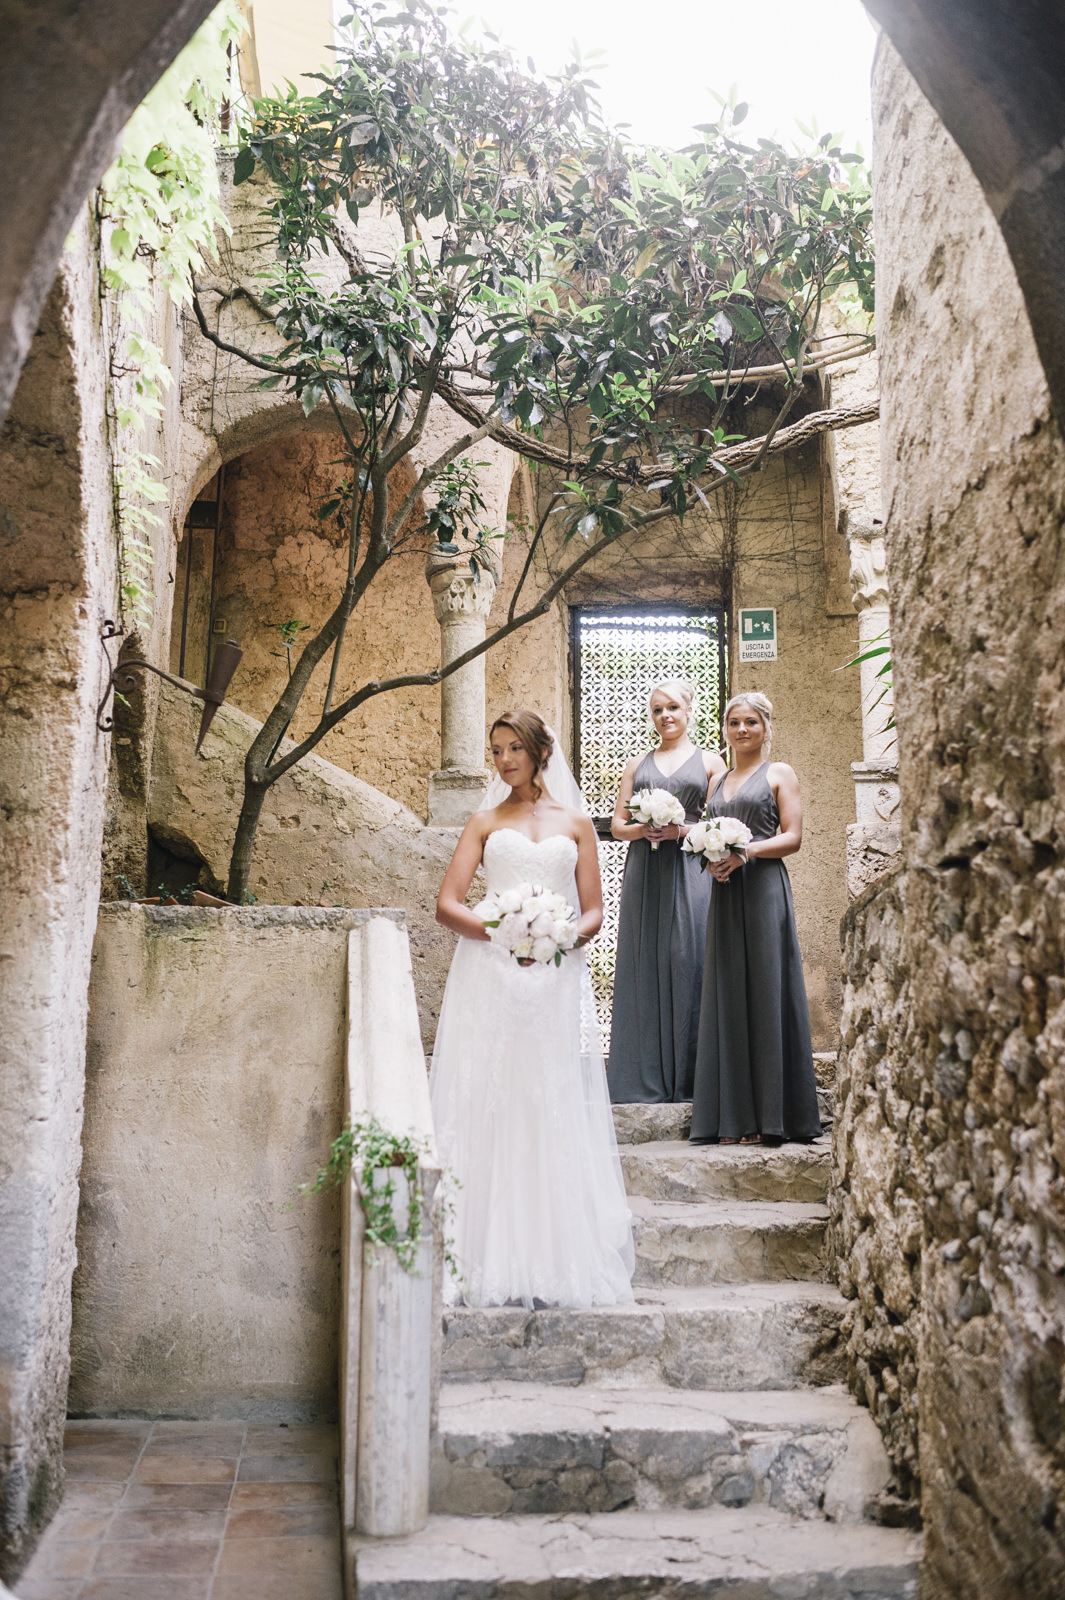 the bride and two bridesmaids in villa cimbrone